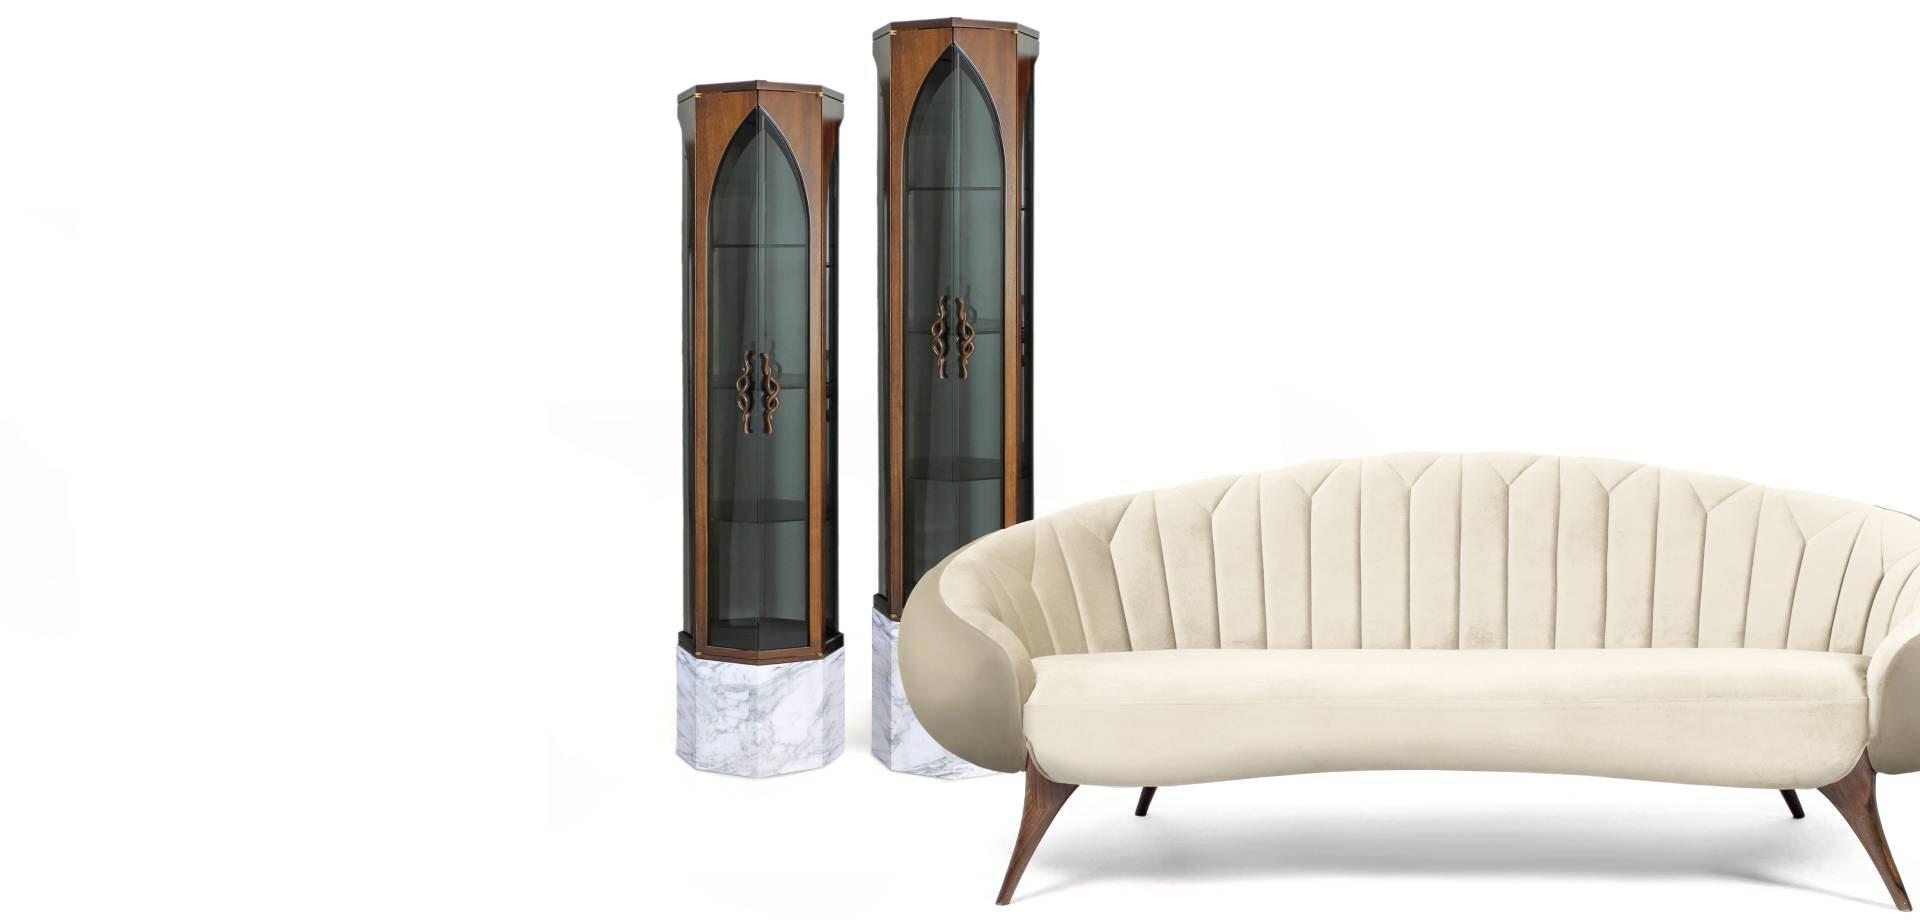 Hikma display_Jal mahal sofa_by Alma de LUCE